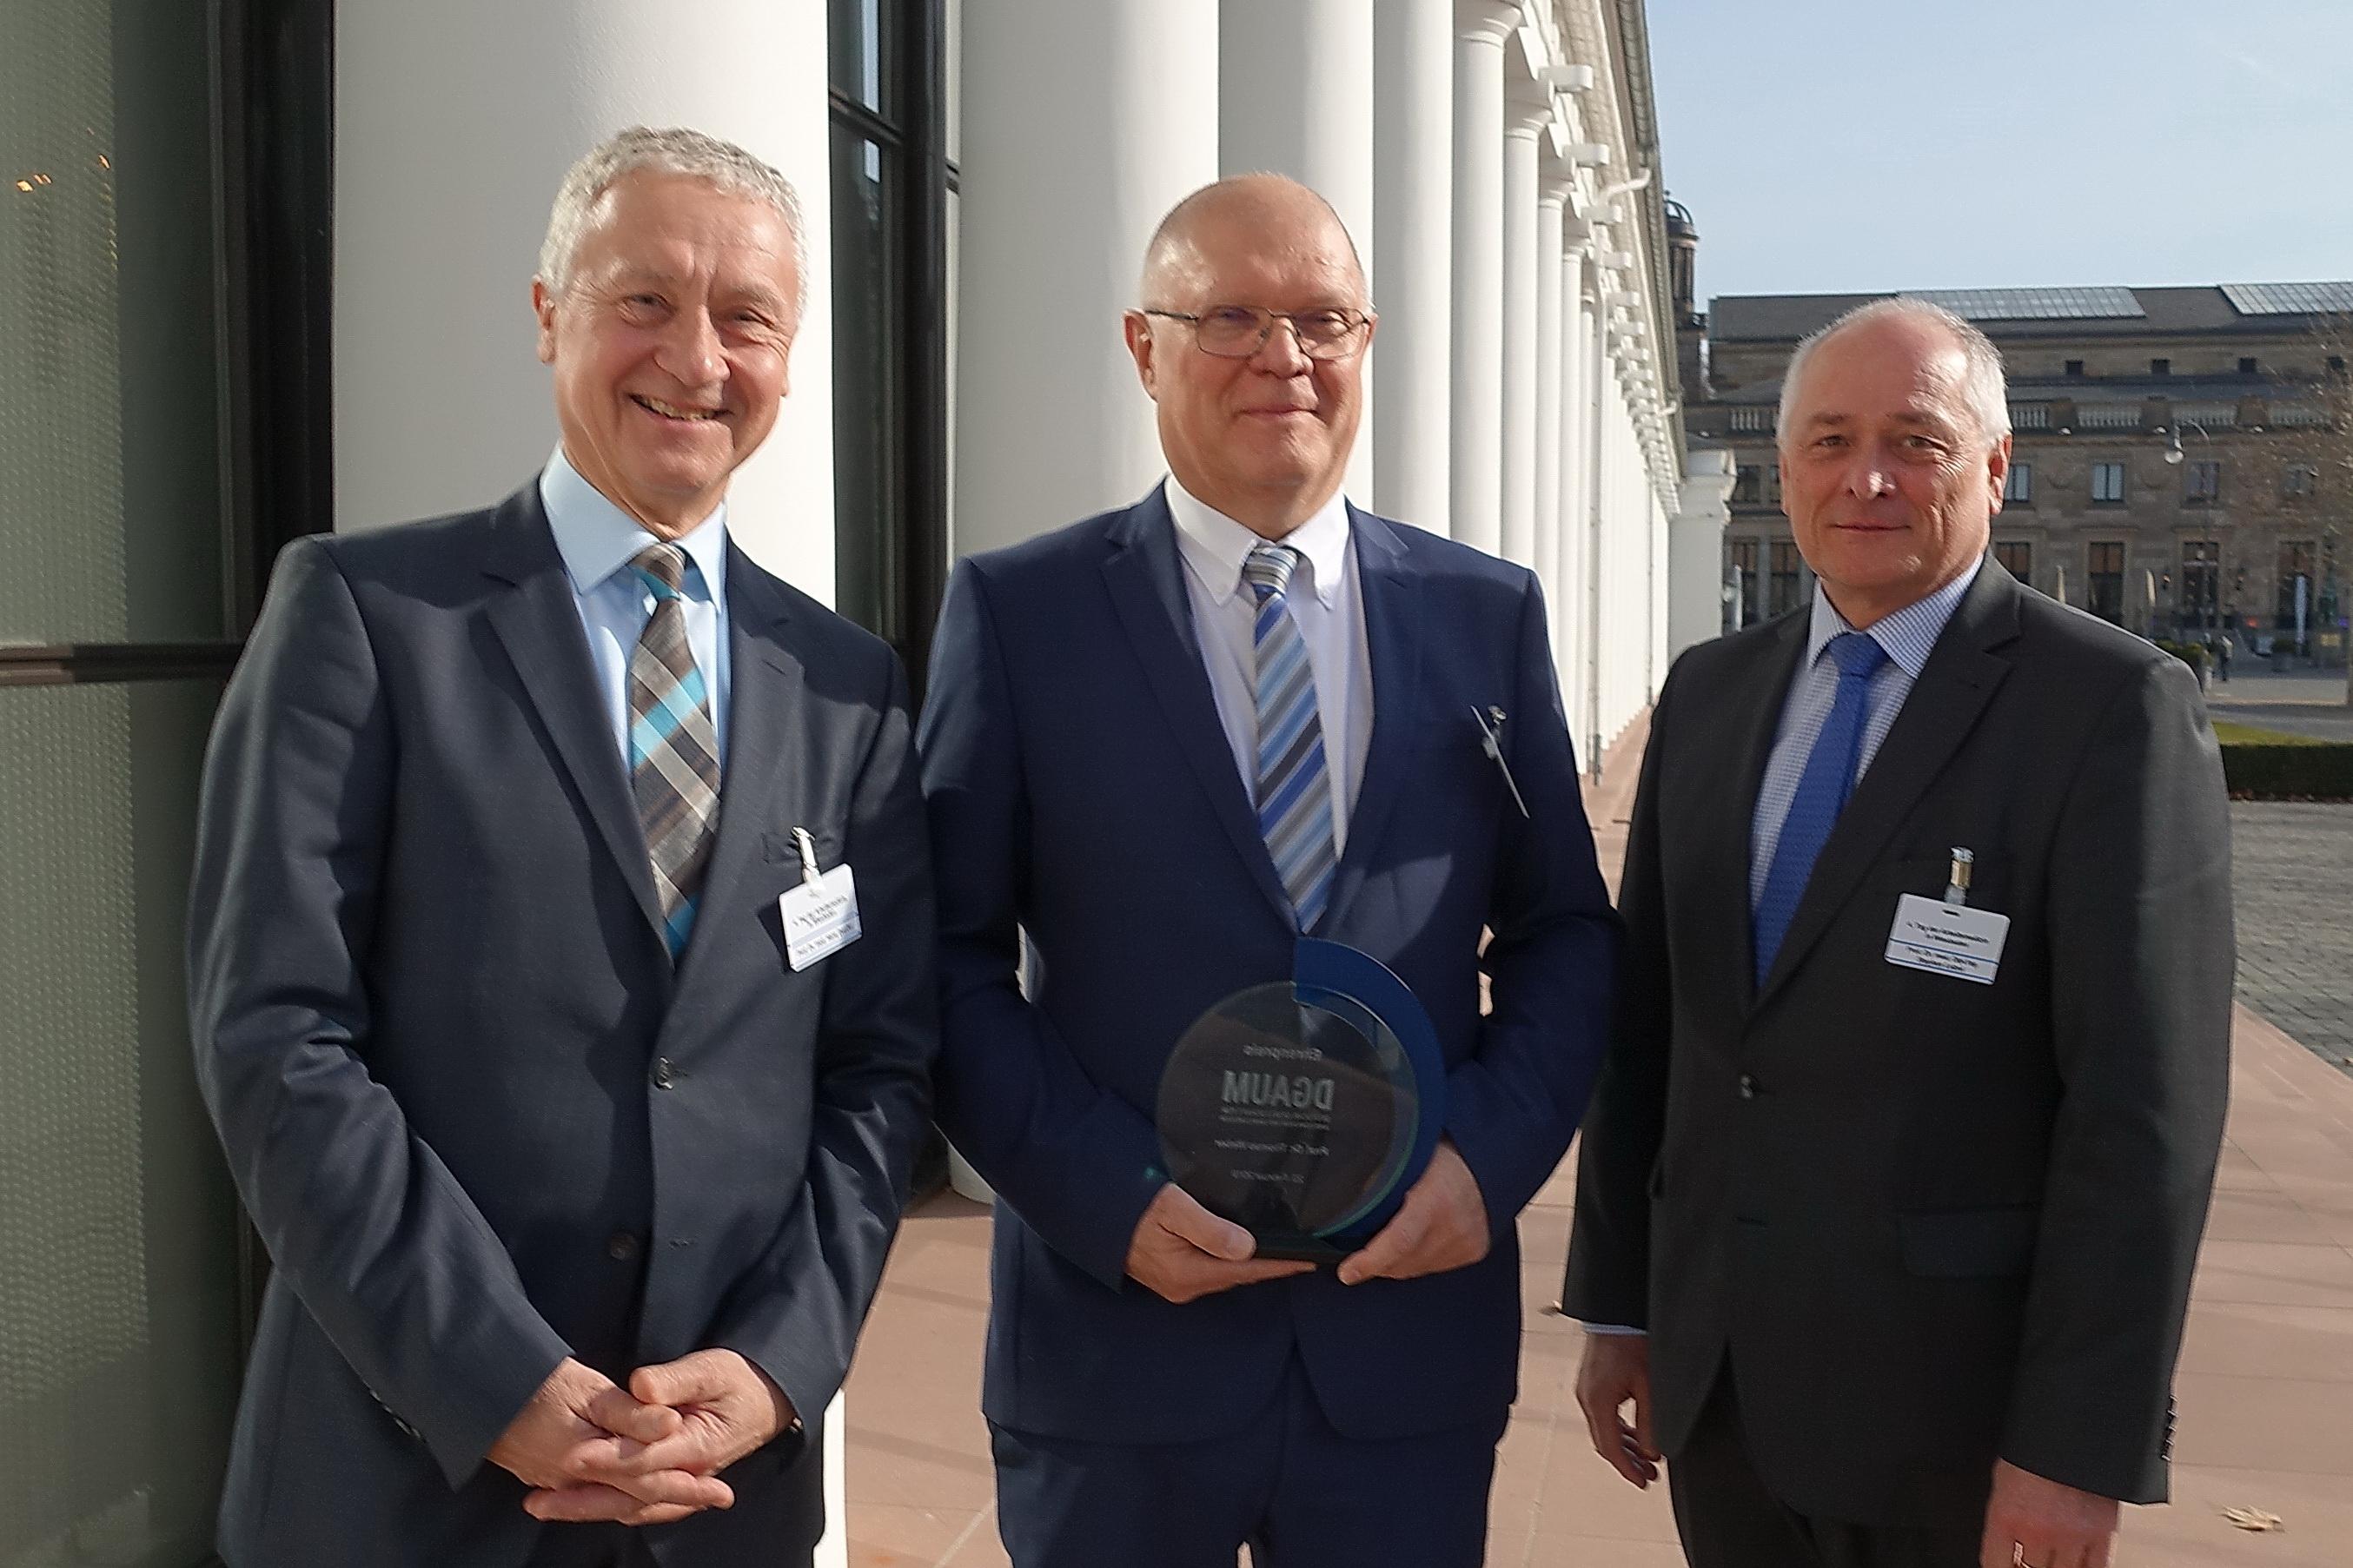 DGAUM Prof. Dr. med. Thomas Weber Ehrenpreis